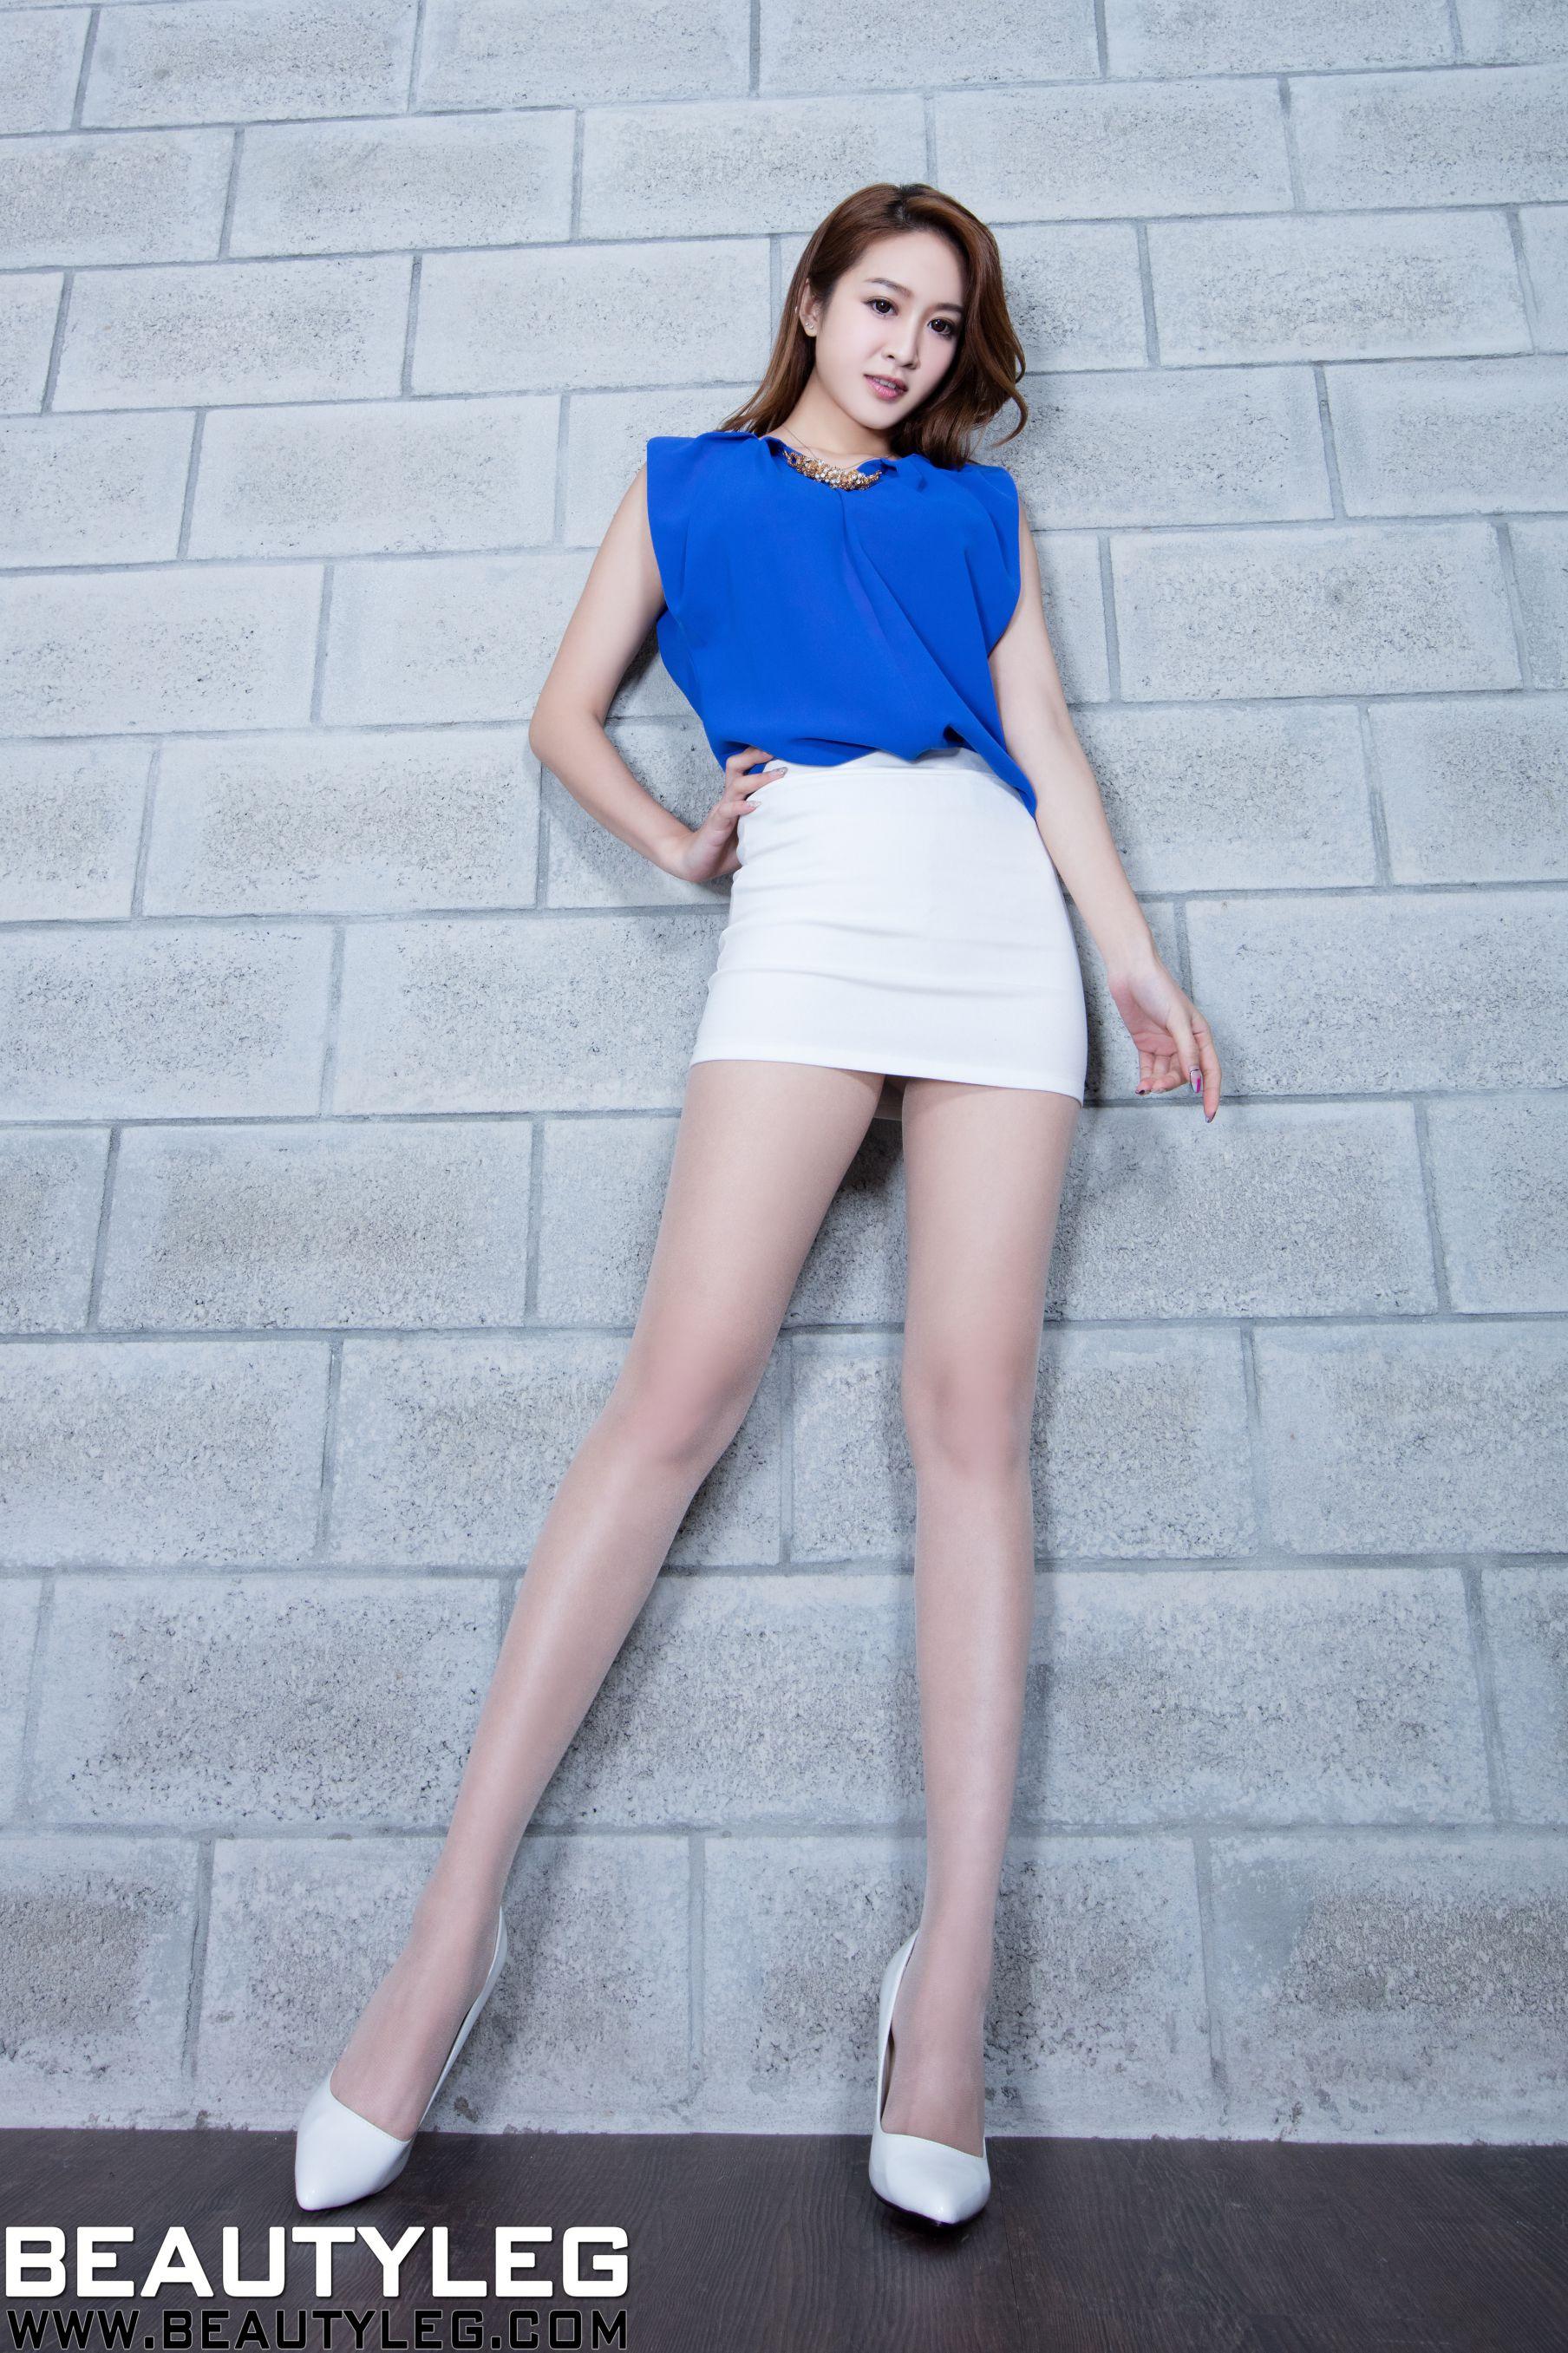 VOL.1840 [Beautyleg]美腿情趣皮衣美女:康凯乐(腿模Kaylar)高品质写真套图(45P)